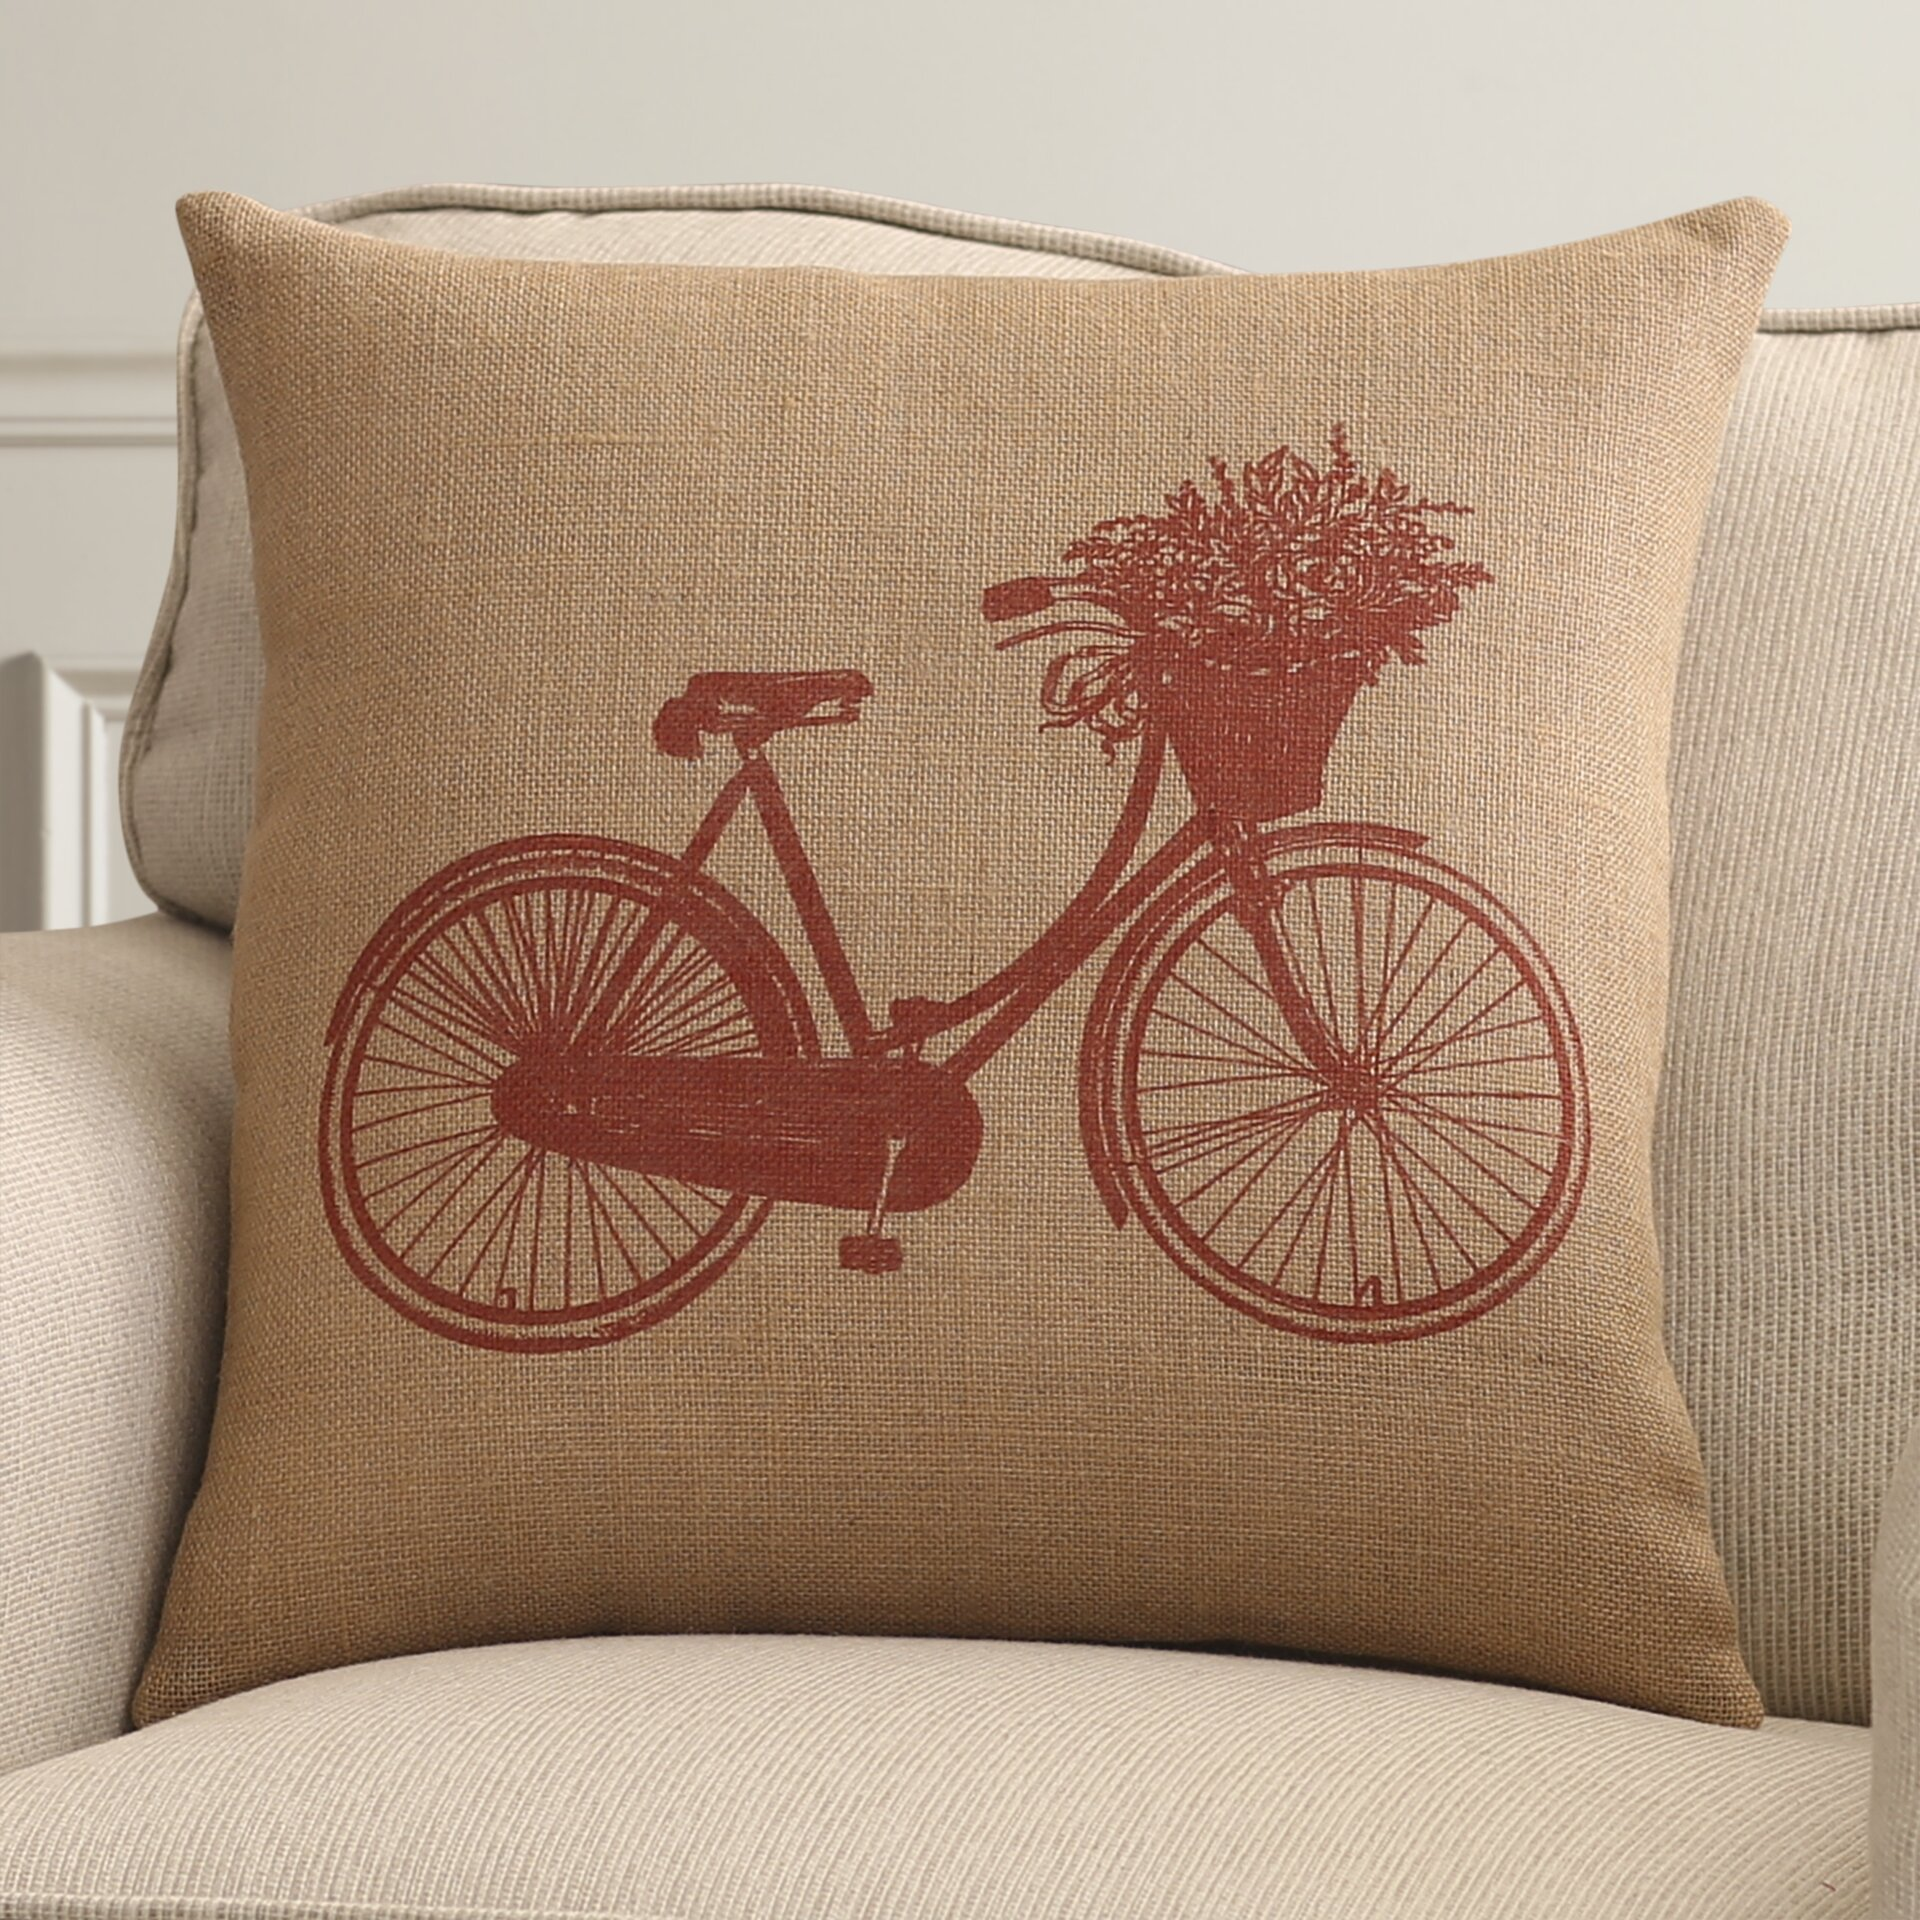 Throw Pillows With Bikes : Alcott Hill Bike Throw Pillow & Reviews Wayfair